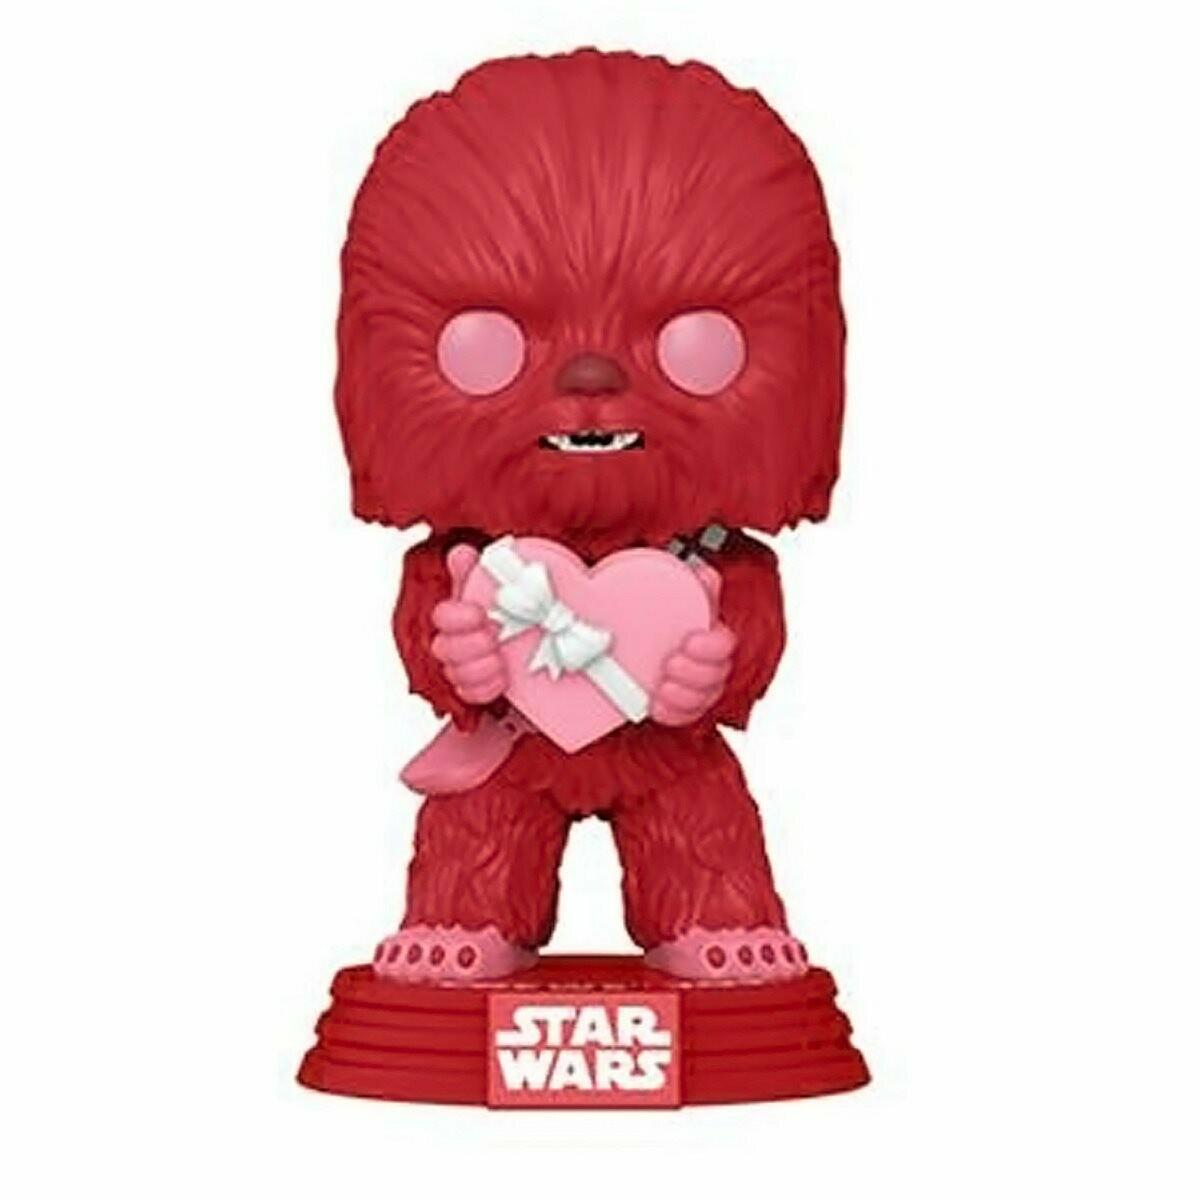 Funko Star Wars Valentine - Cupid Chewbacca Pop! Vinyl Figure